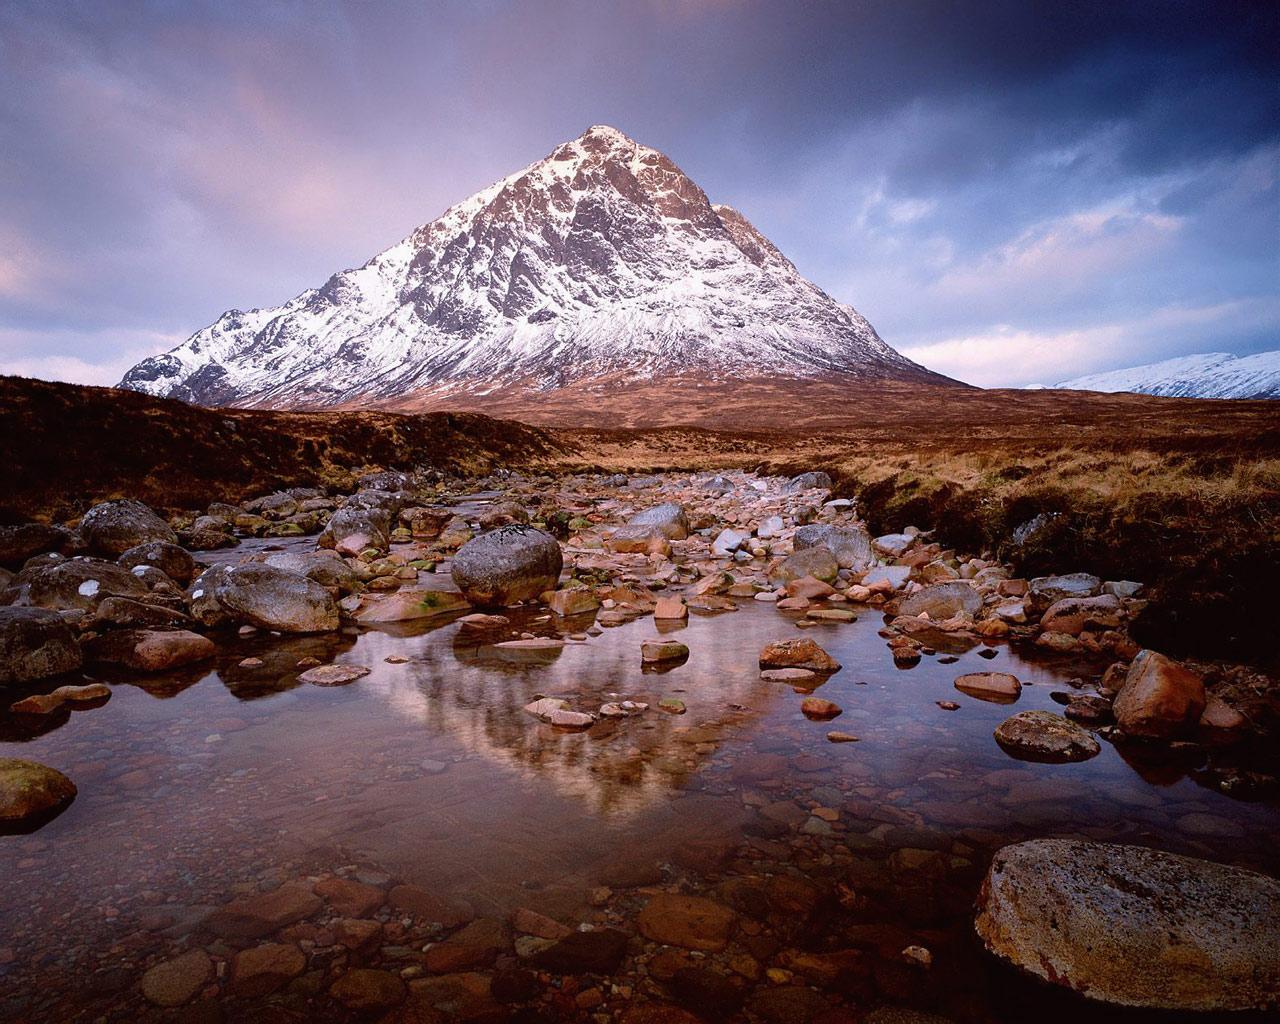 http://3.bp.blogspot.com/-Ho3yGl2cU_o/T0aIIemxu7I/AAAAAAAADUA/wGhrnn2265E/s1600/Buachaille_Etive_Mor,_Glencoe_Scotland.jpg